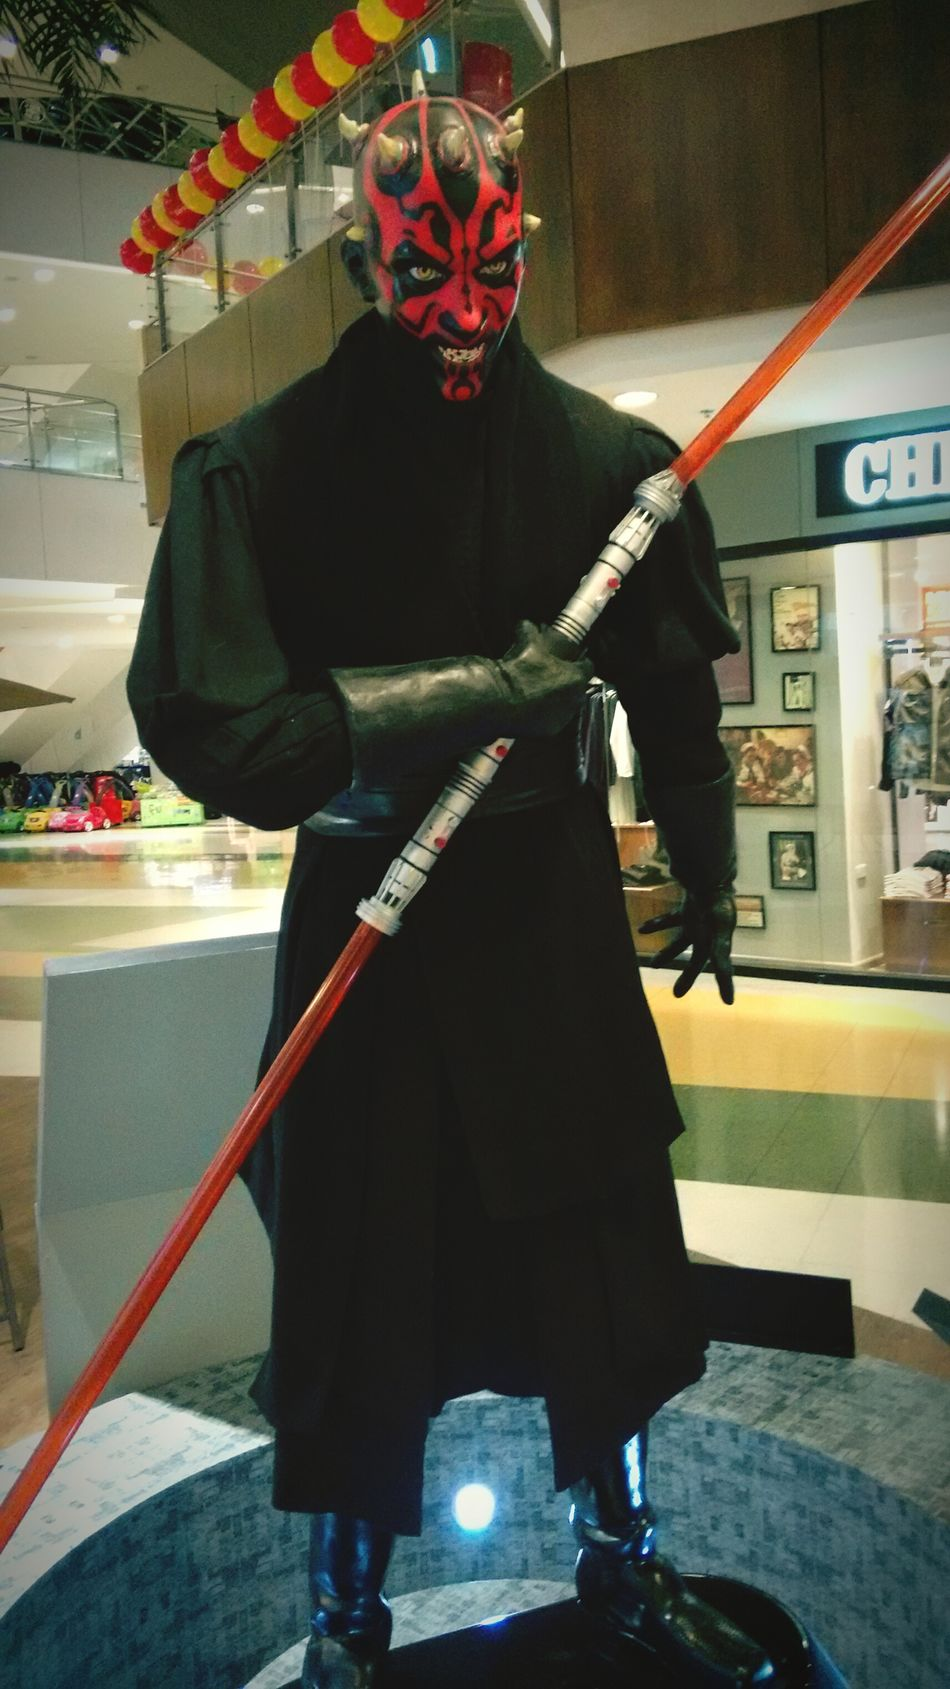 Fantastic Exhibition Sith Star Wars Star Wars Exhibition Action Darth Maul